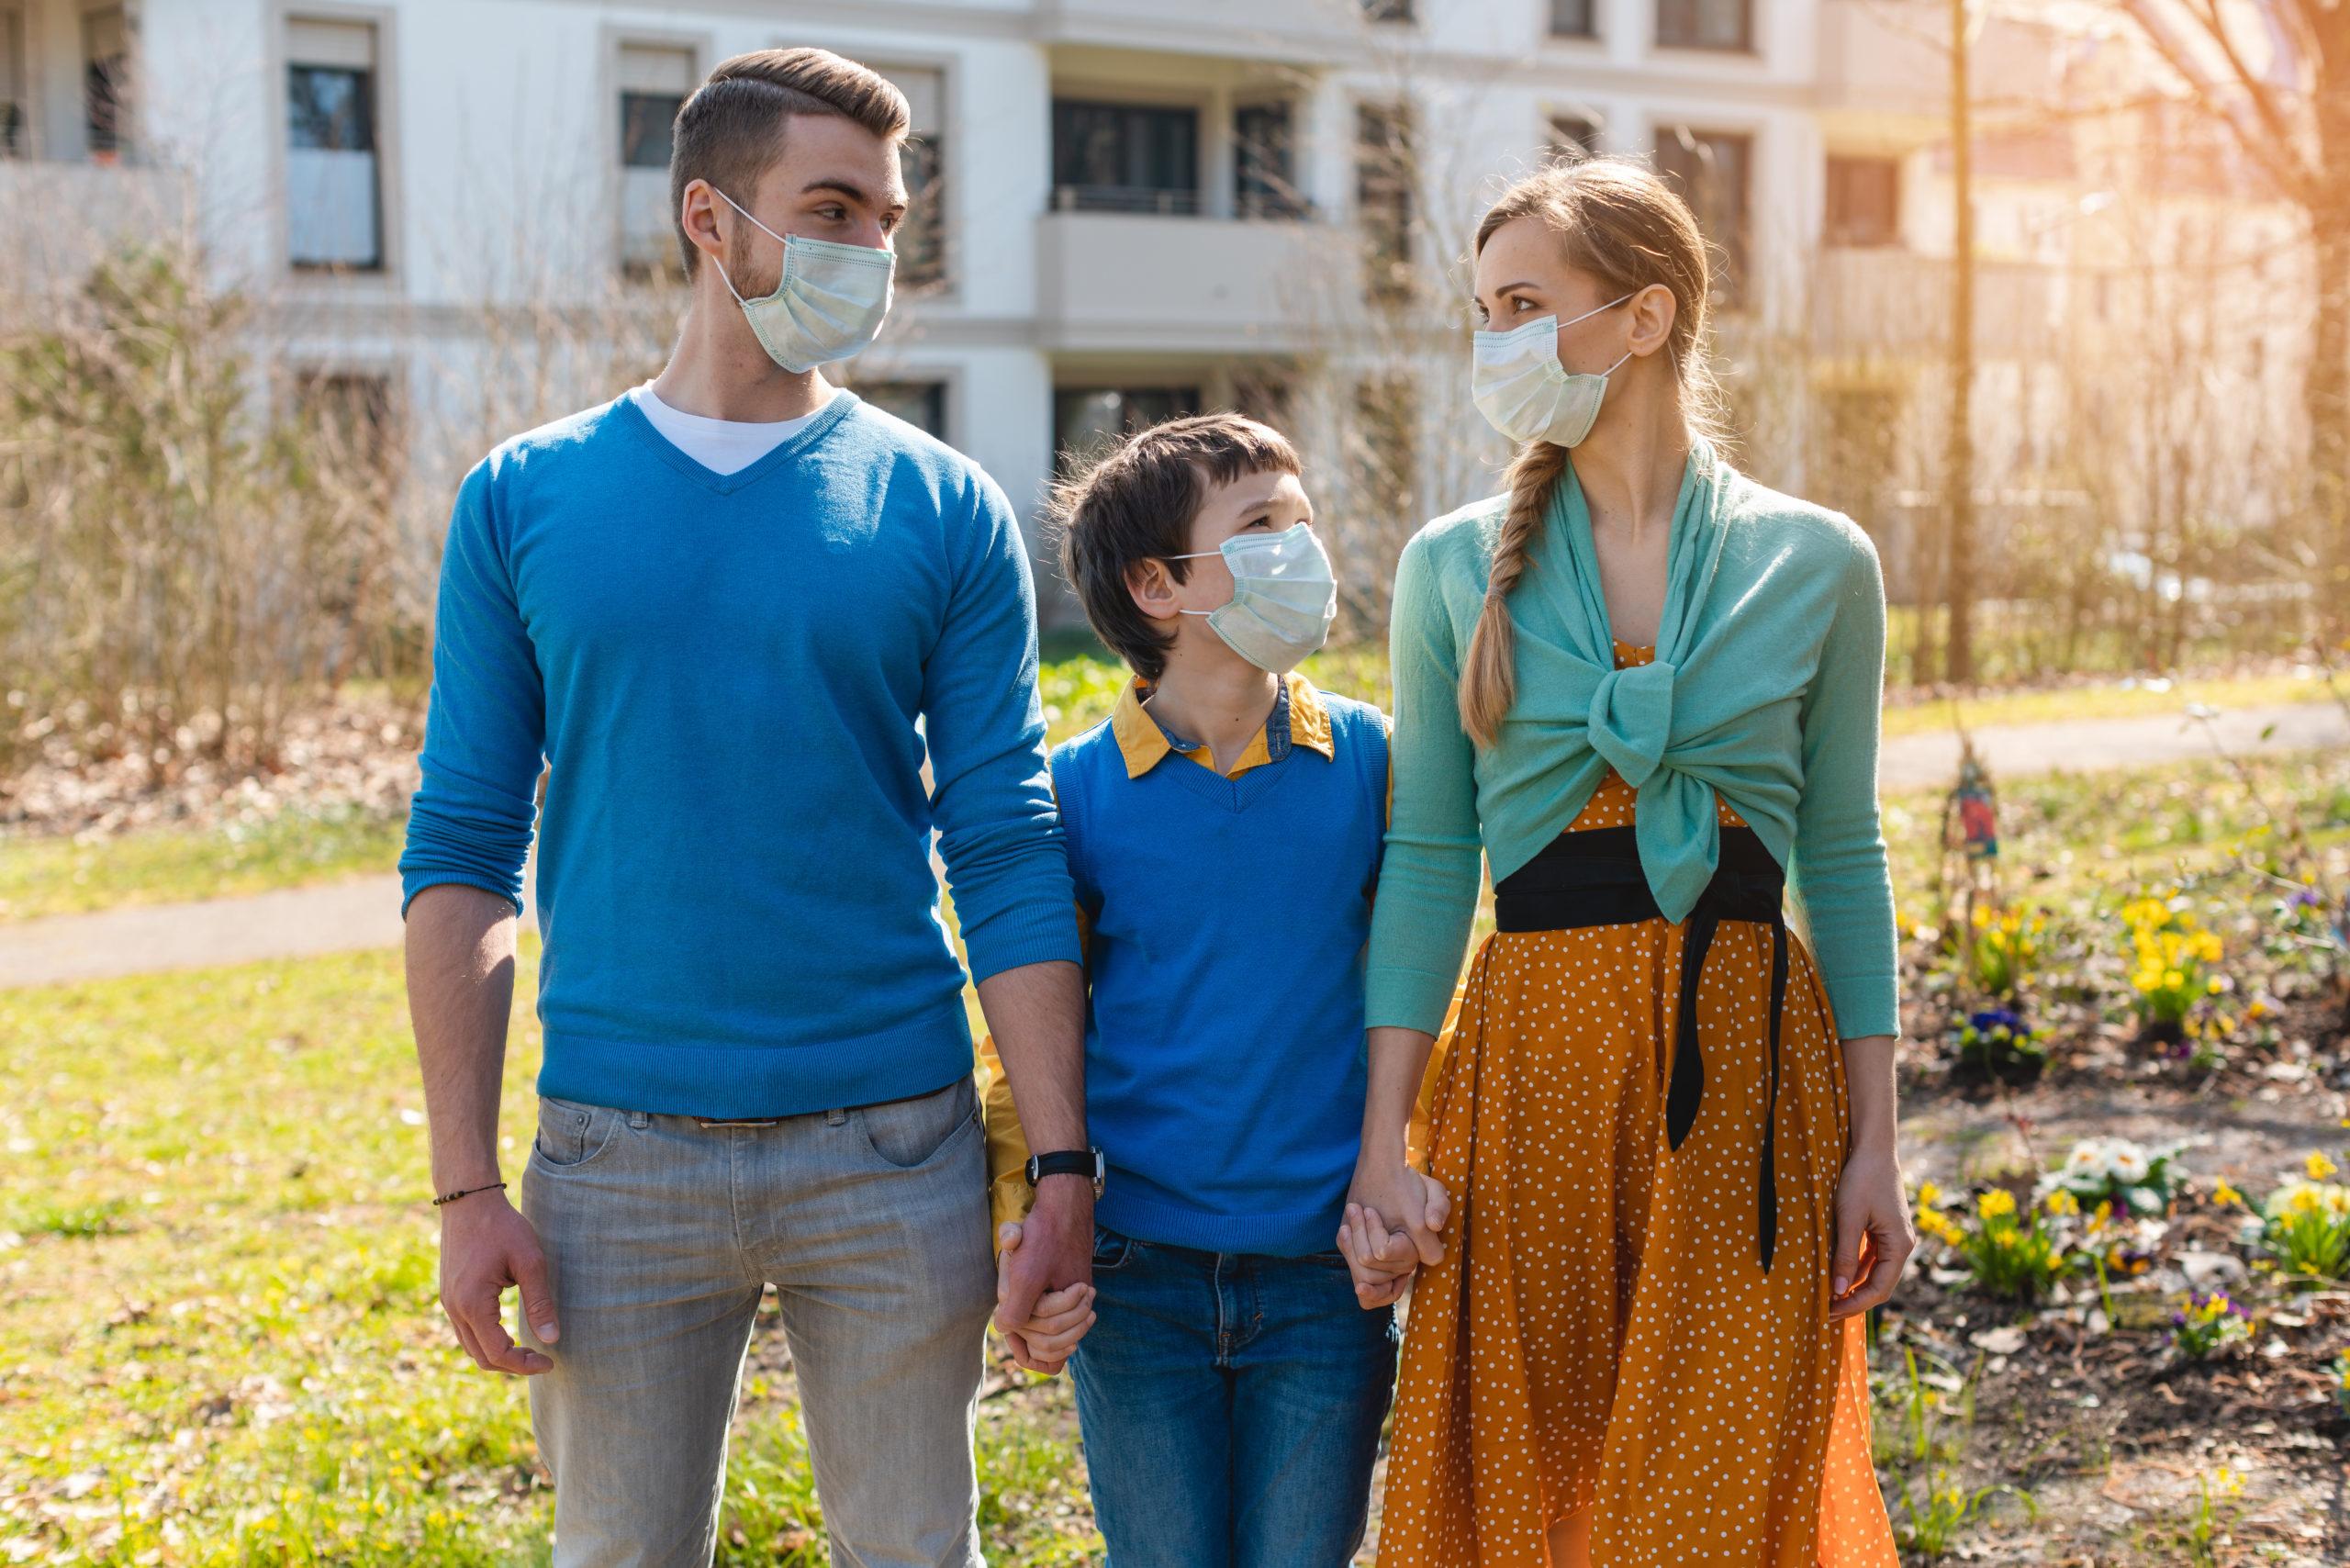 Family during coronavirus crises having a walk